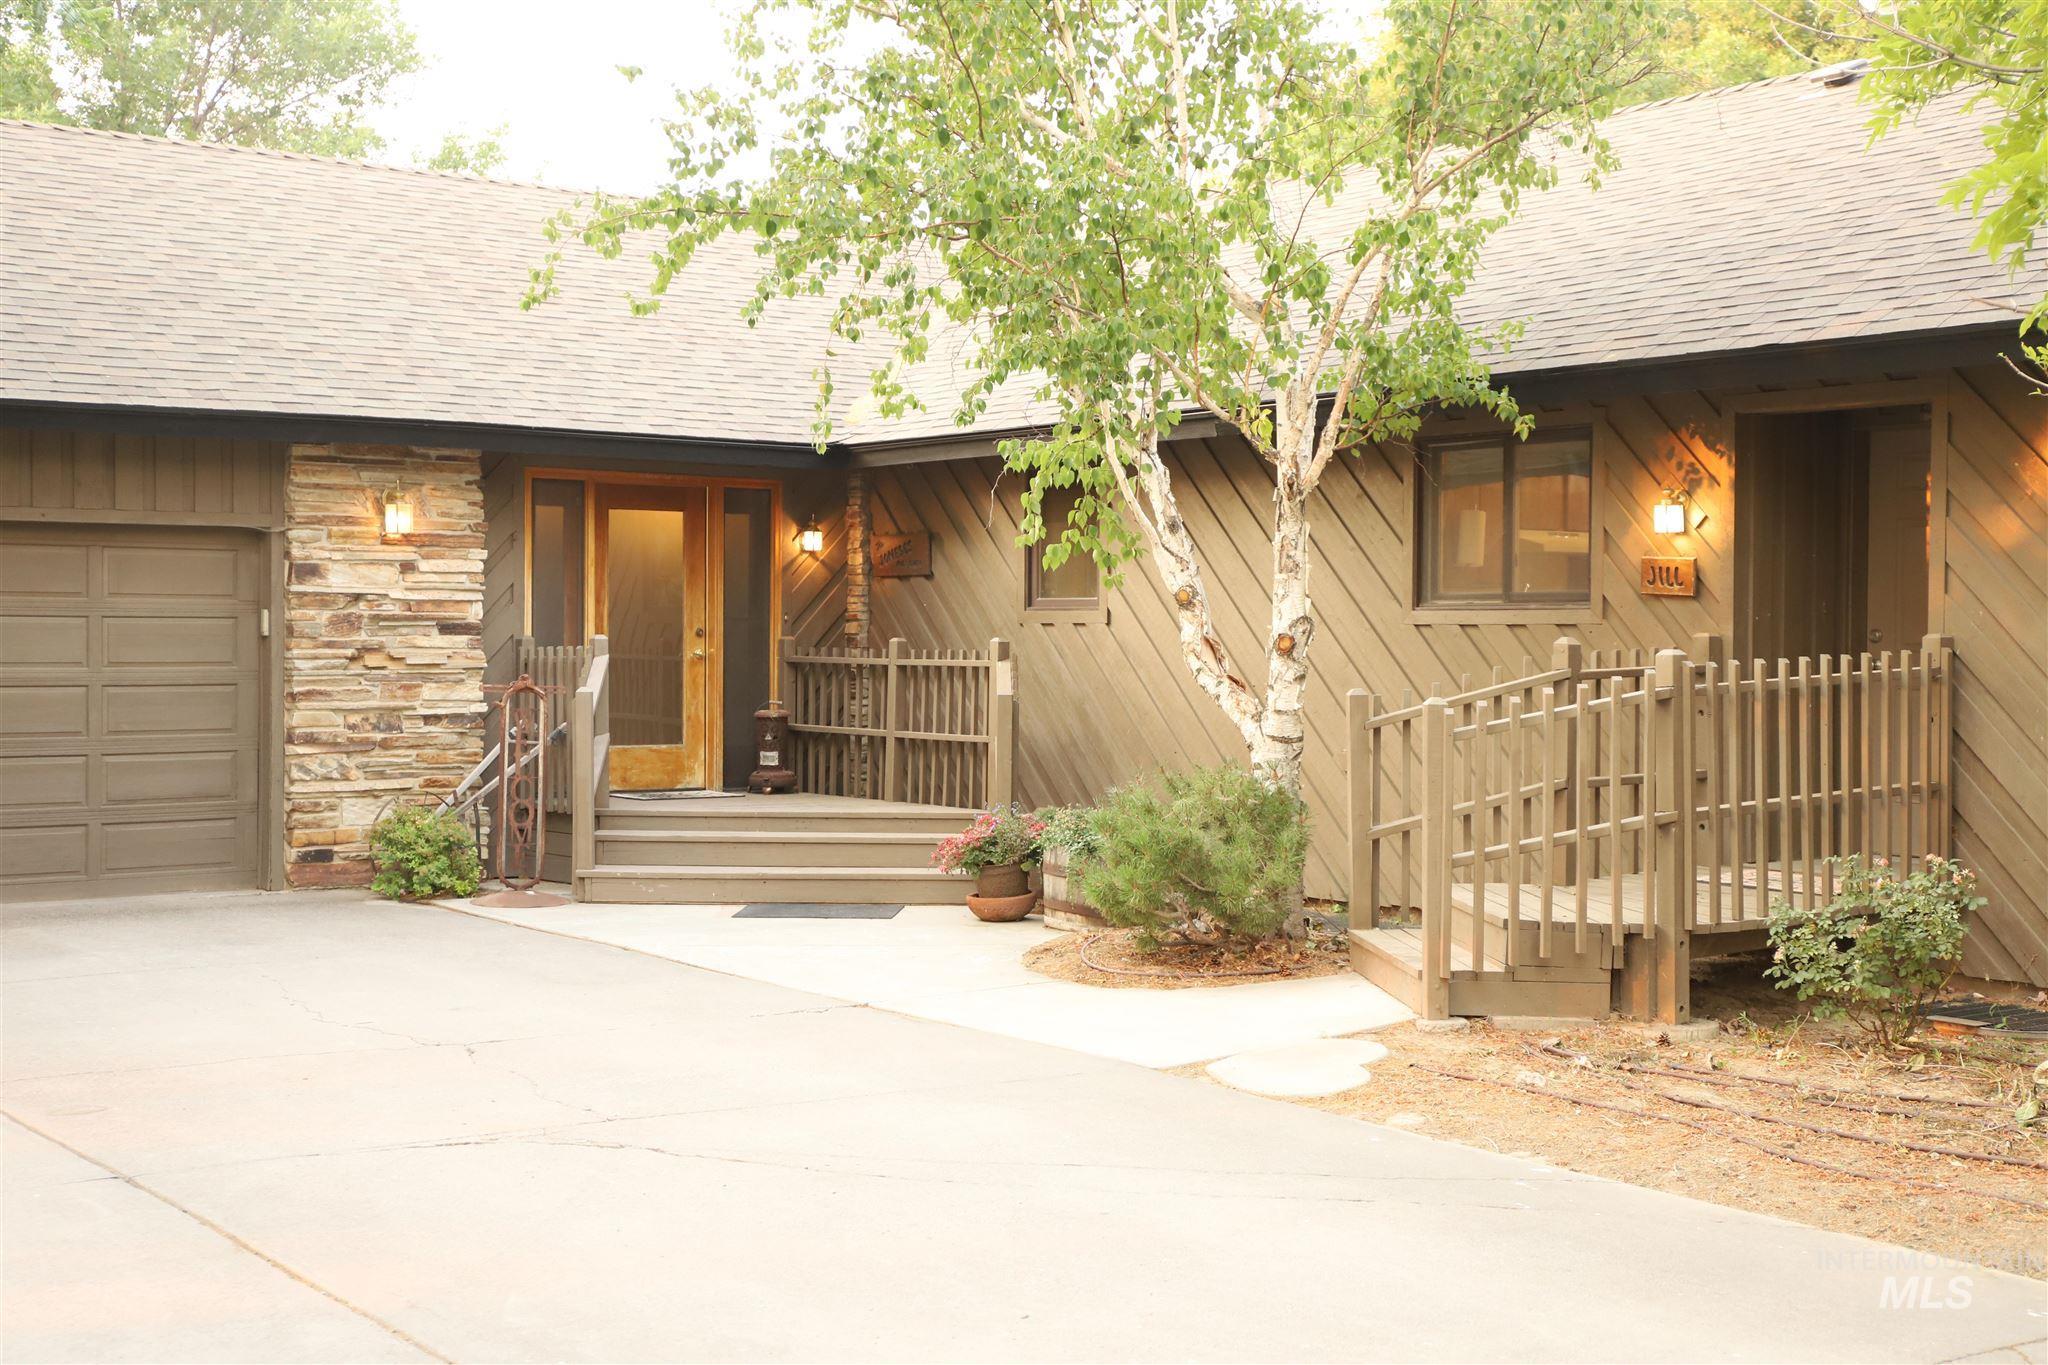 3264 E 3200 N Property Photo